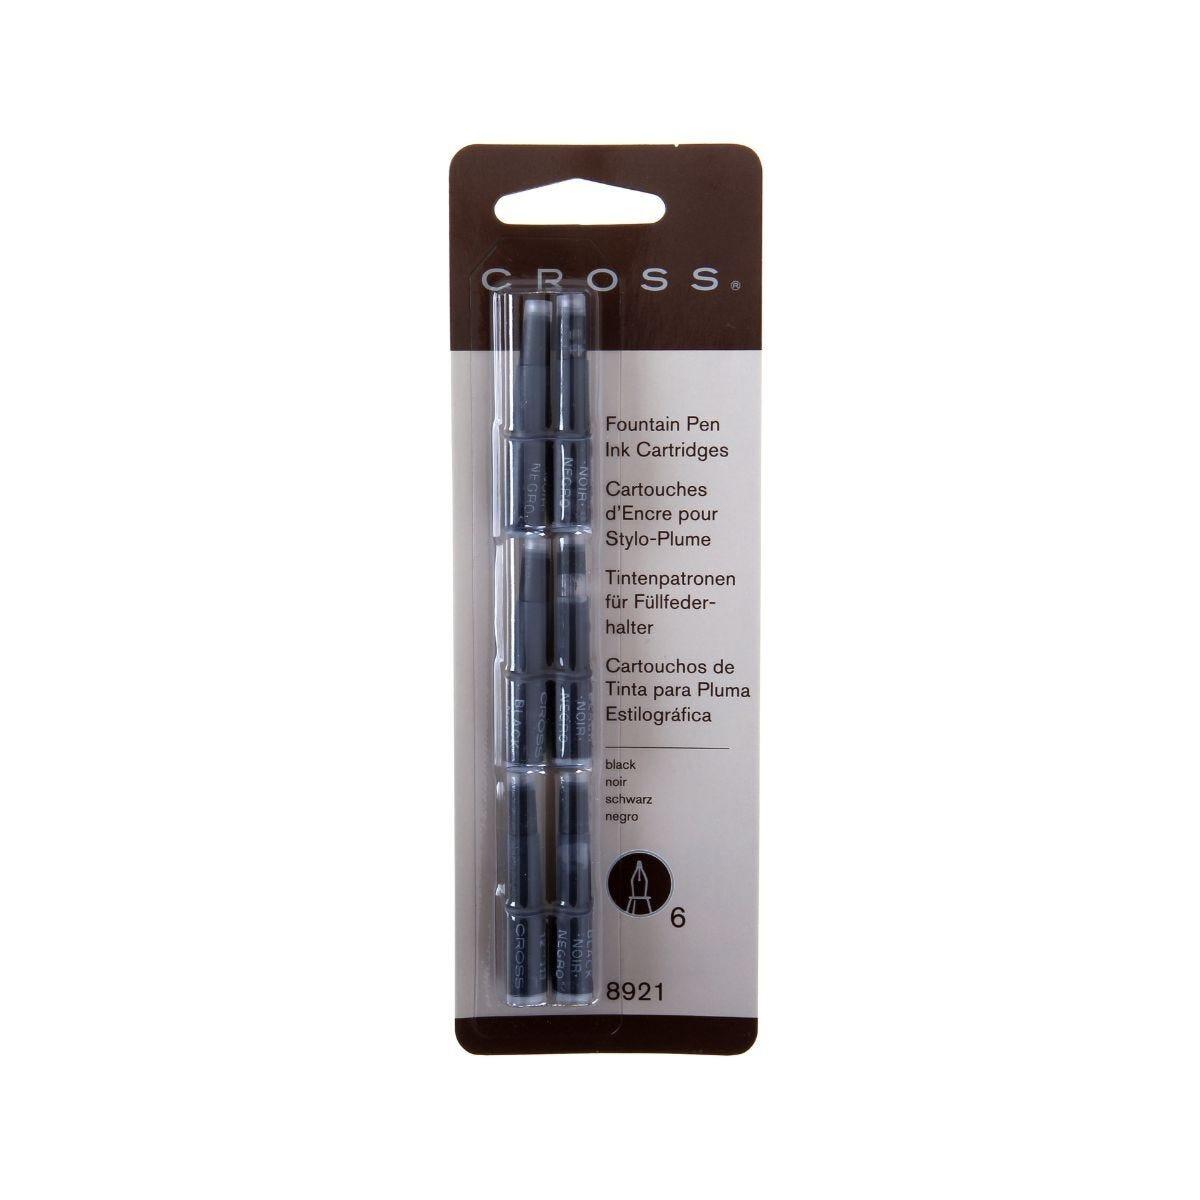 Cross Fountain Pen Ink Cartridges Pack of 6